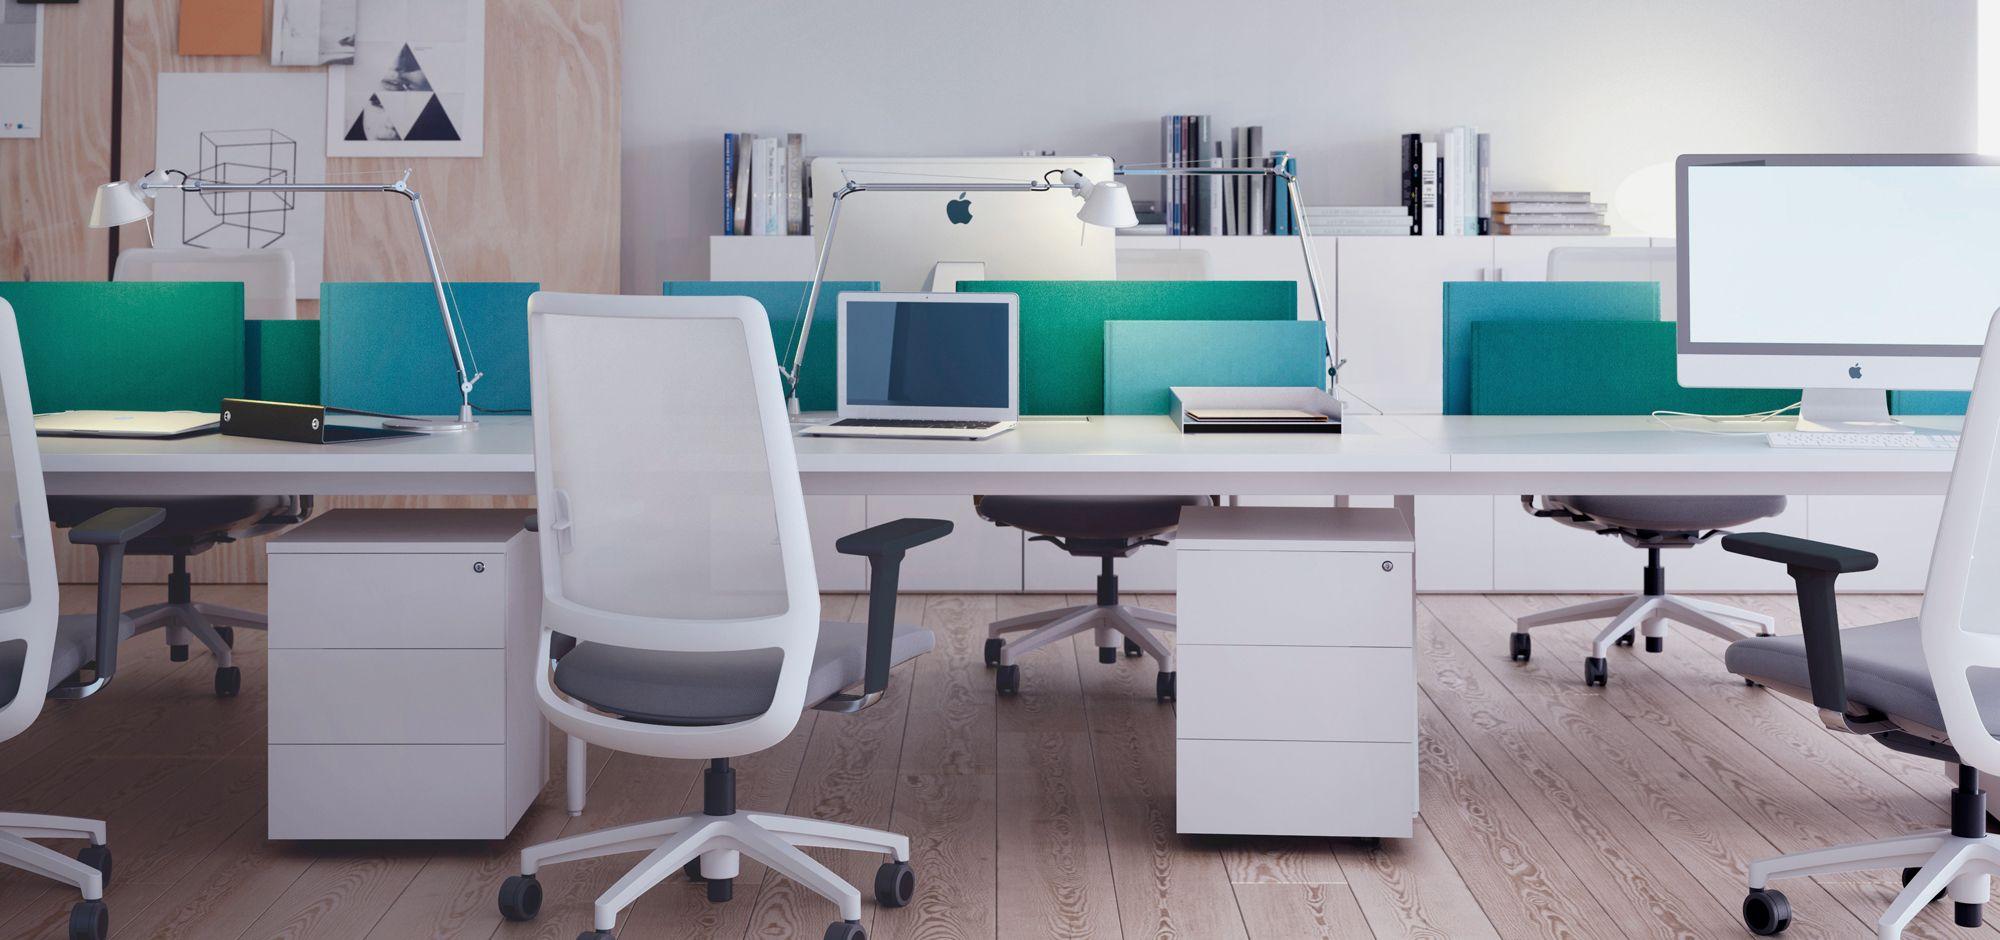 Mobiliario oficina sant cugat del vall s for Proveedores de muebles de oficina